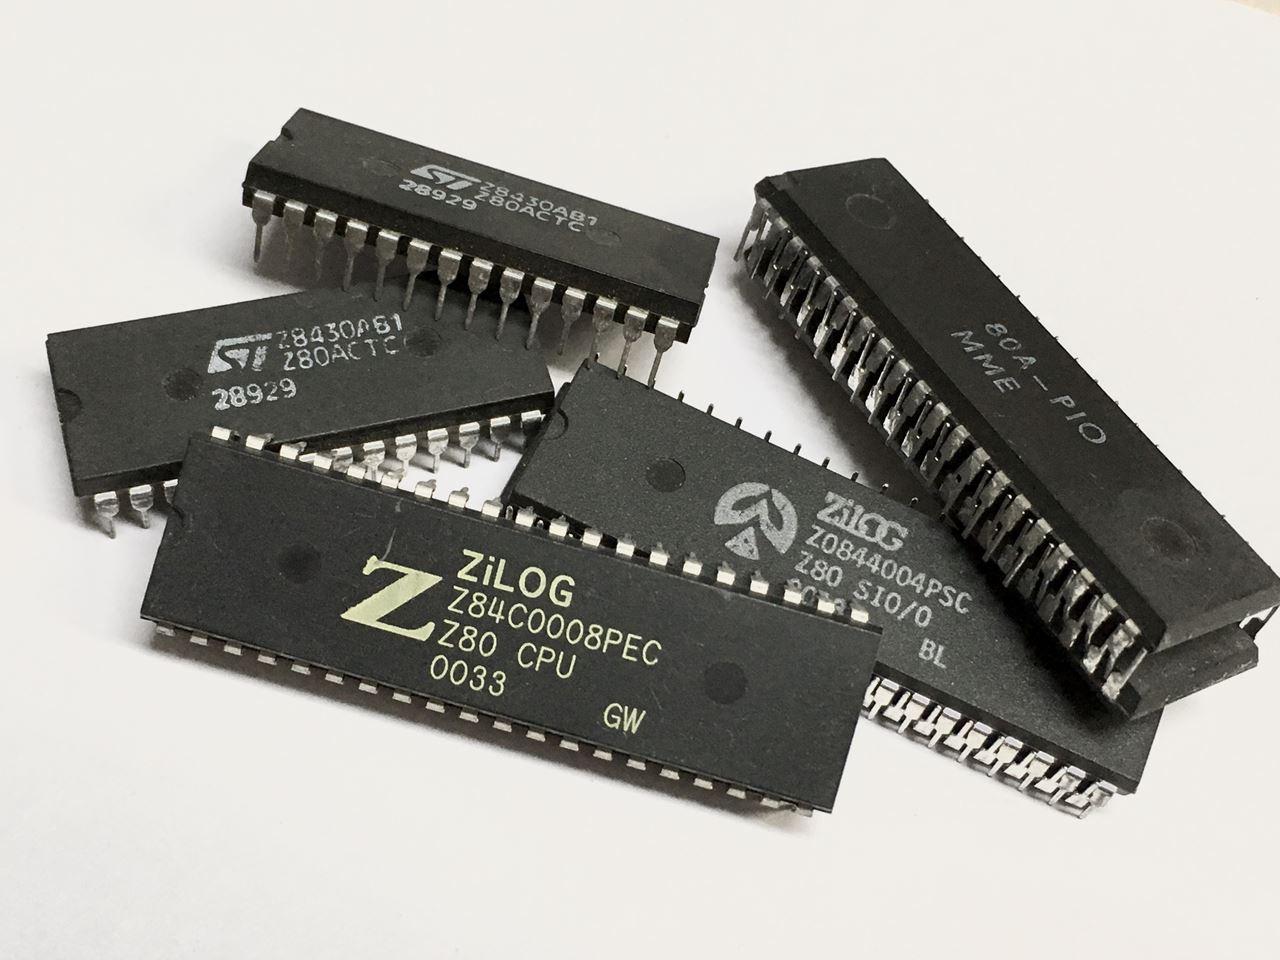 Circuito Integrado : Tv nalber tienda on line circuito integrado z cpu zilog dip